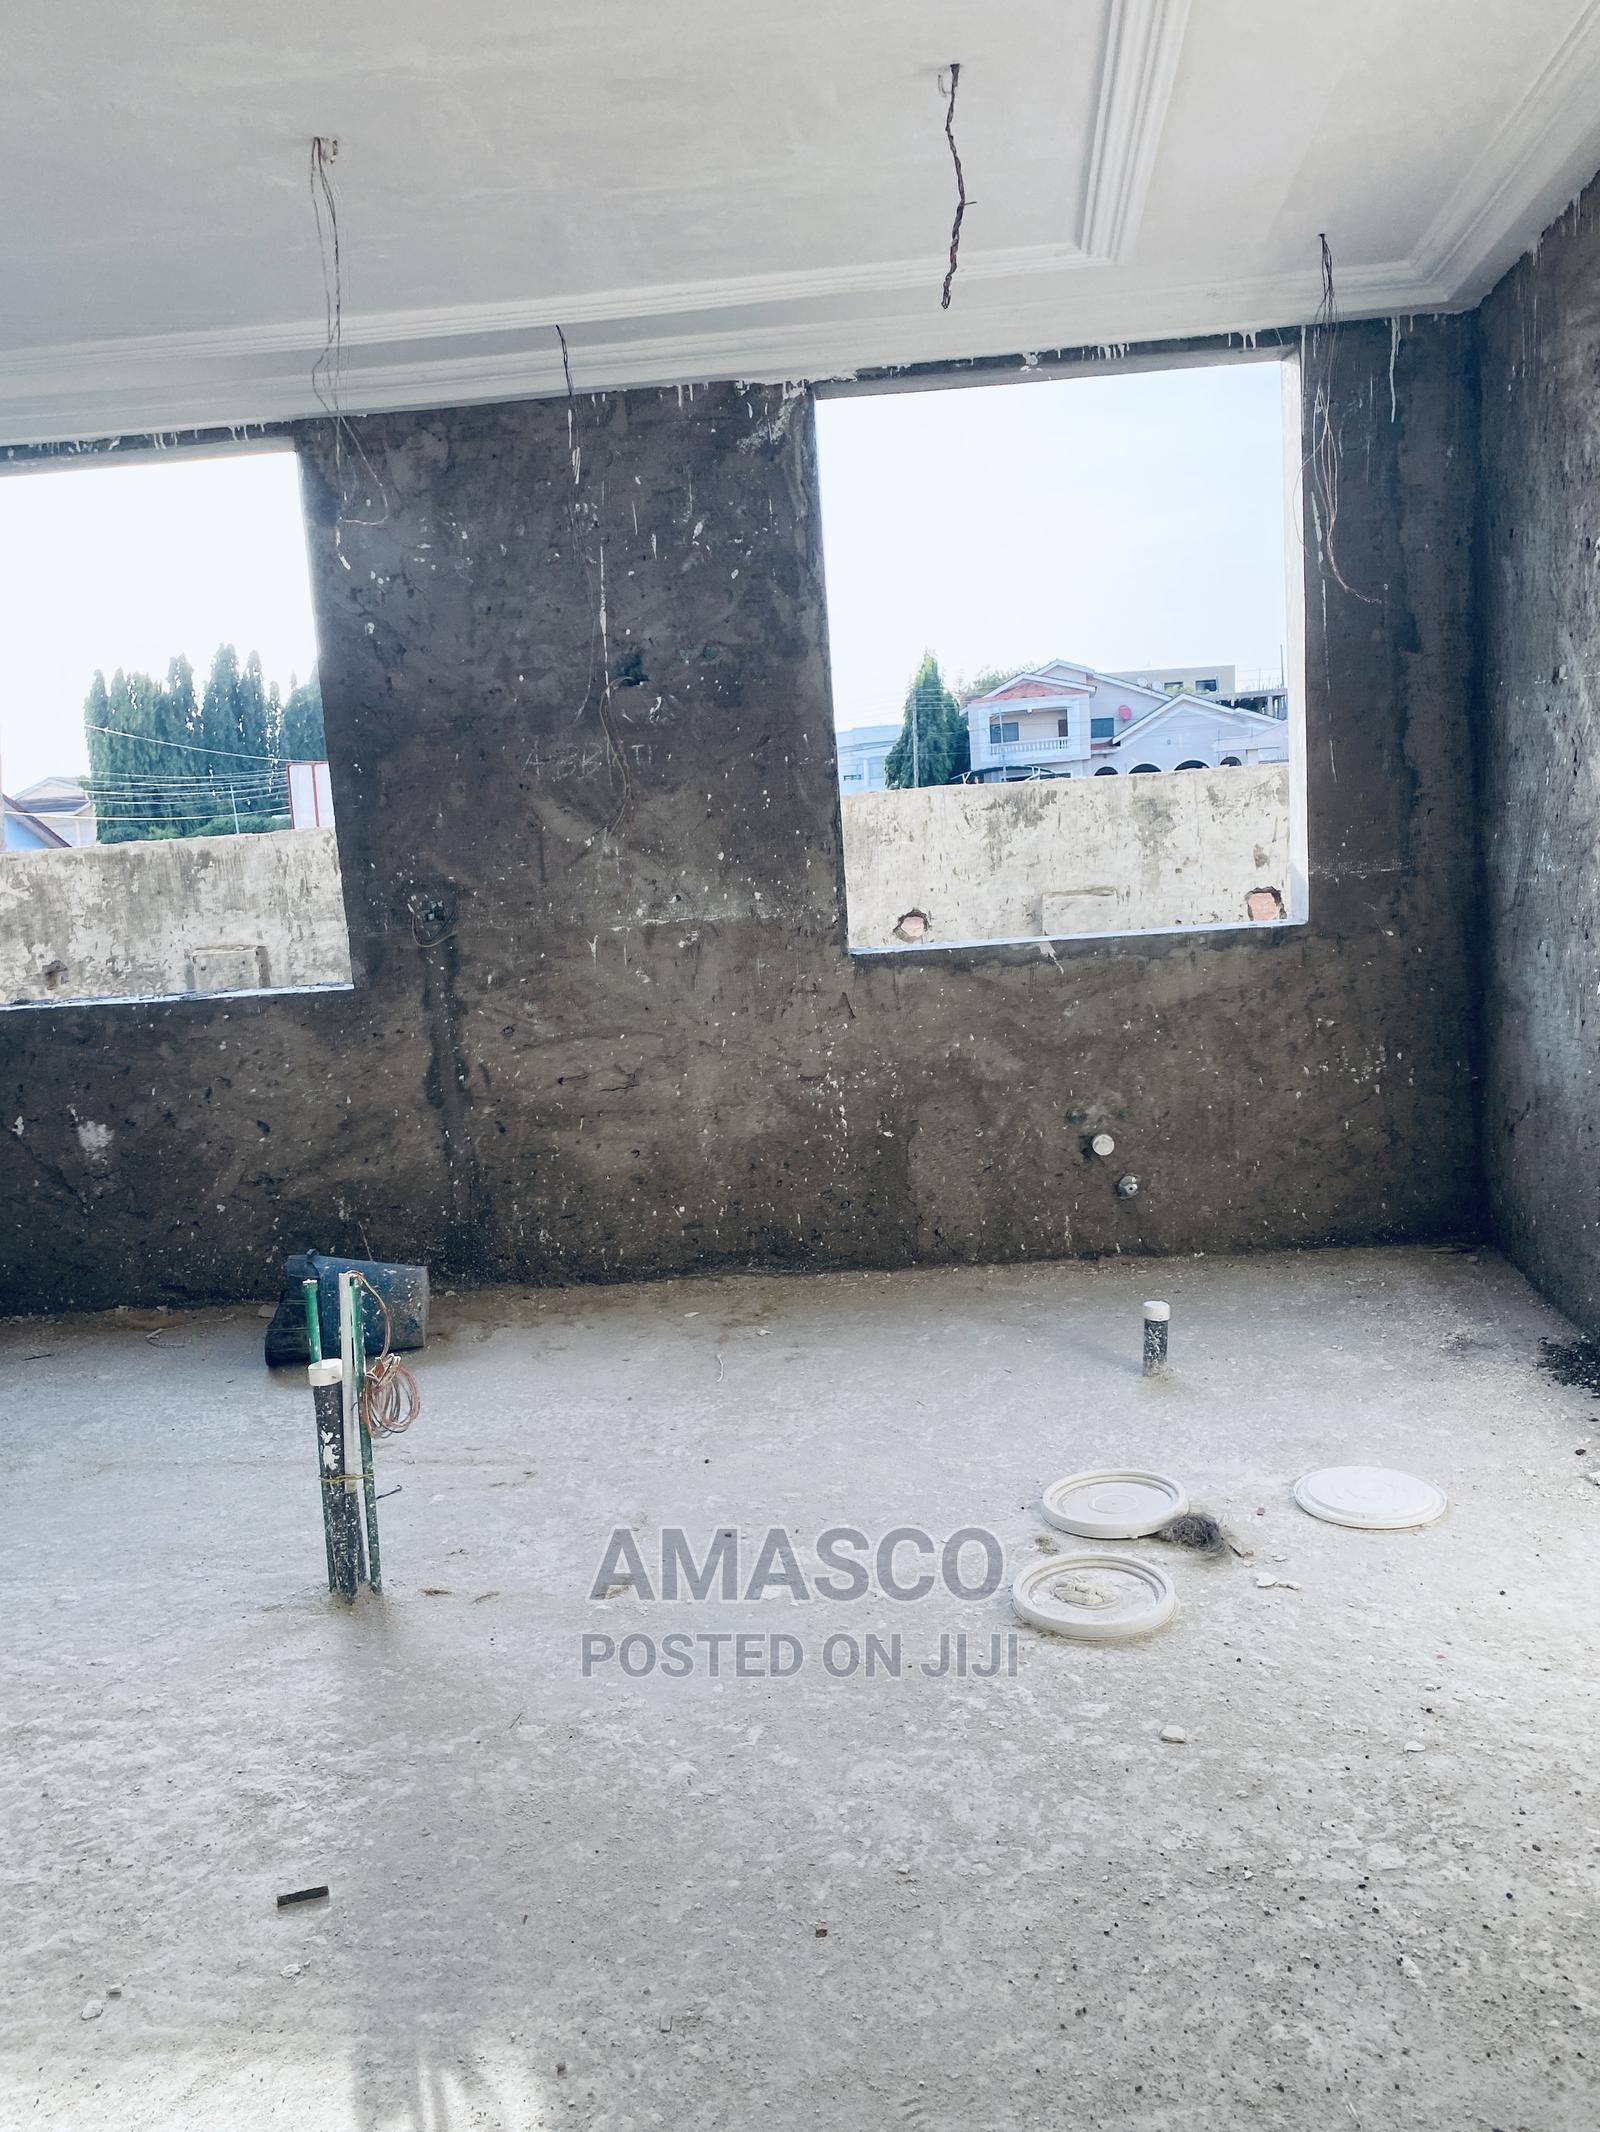 5 Bedroom for Sake at East Legon | Houses & Apartments For Sale for sale in East Legon, Greater Accra, Ghana